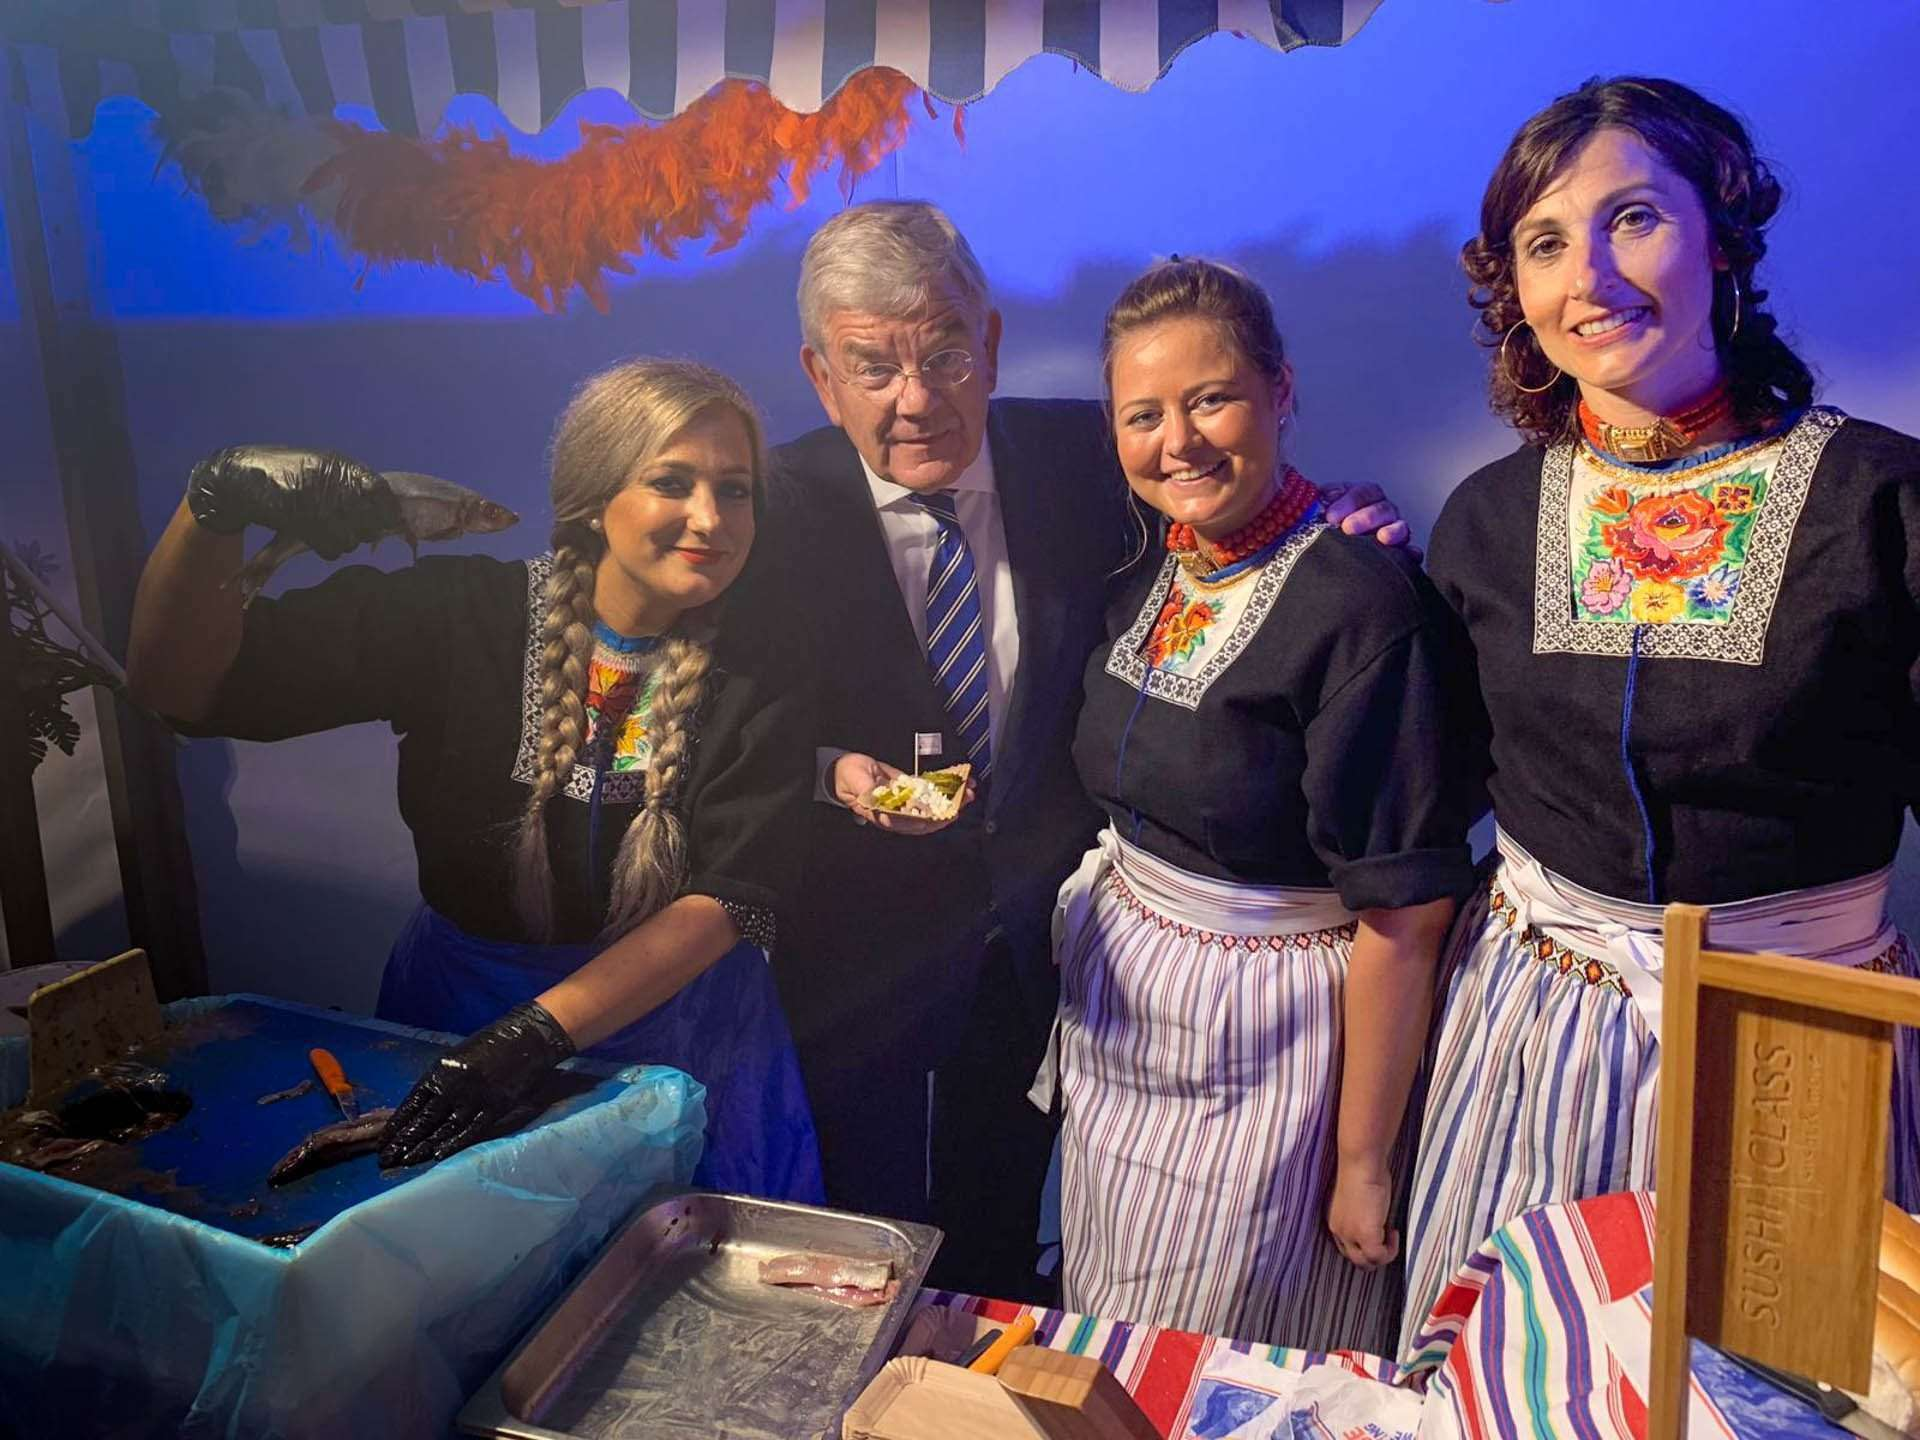 Burgermeester feliciteer Team Peter Tol met overwinning